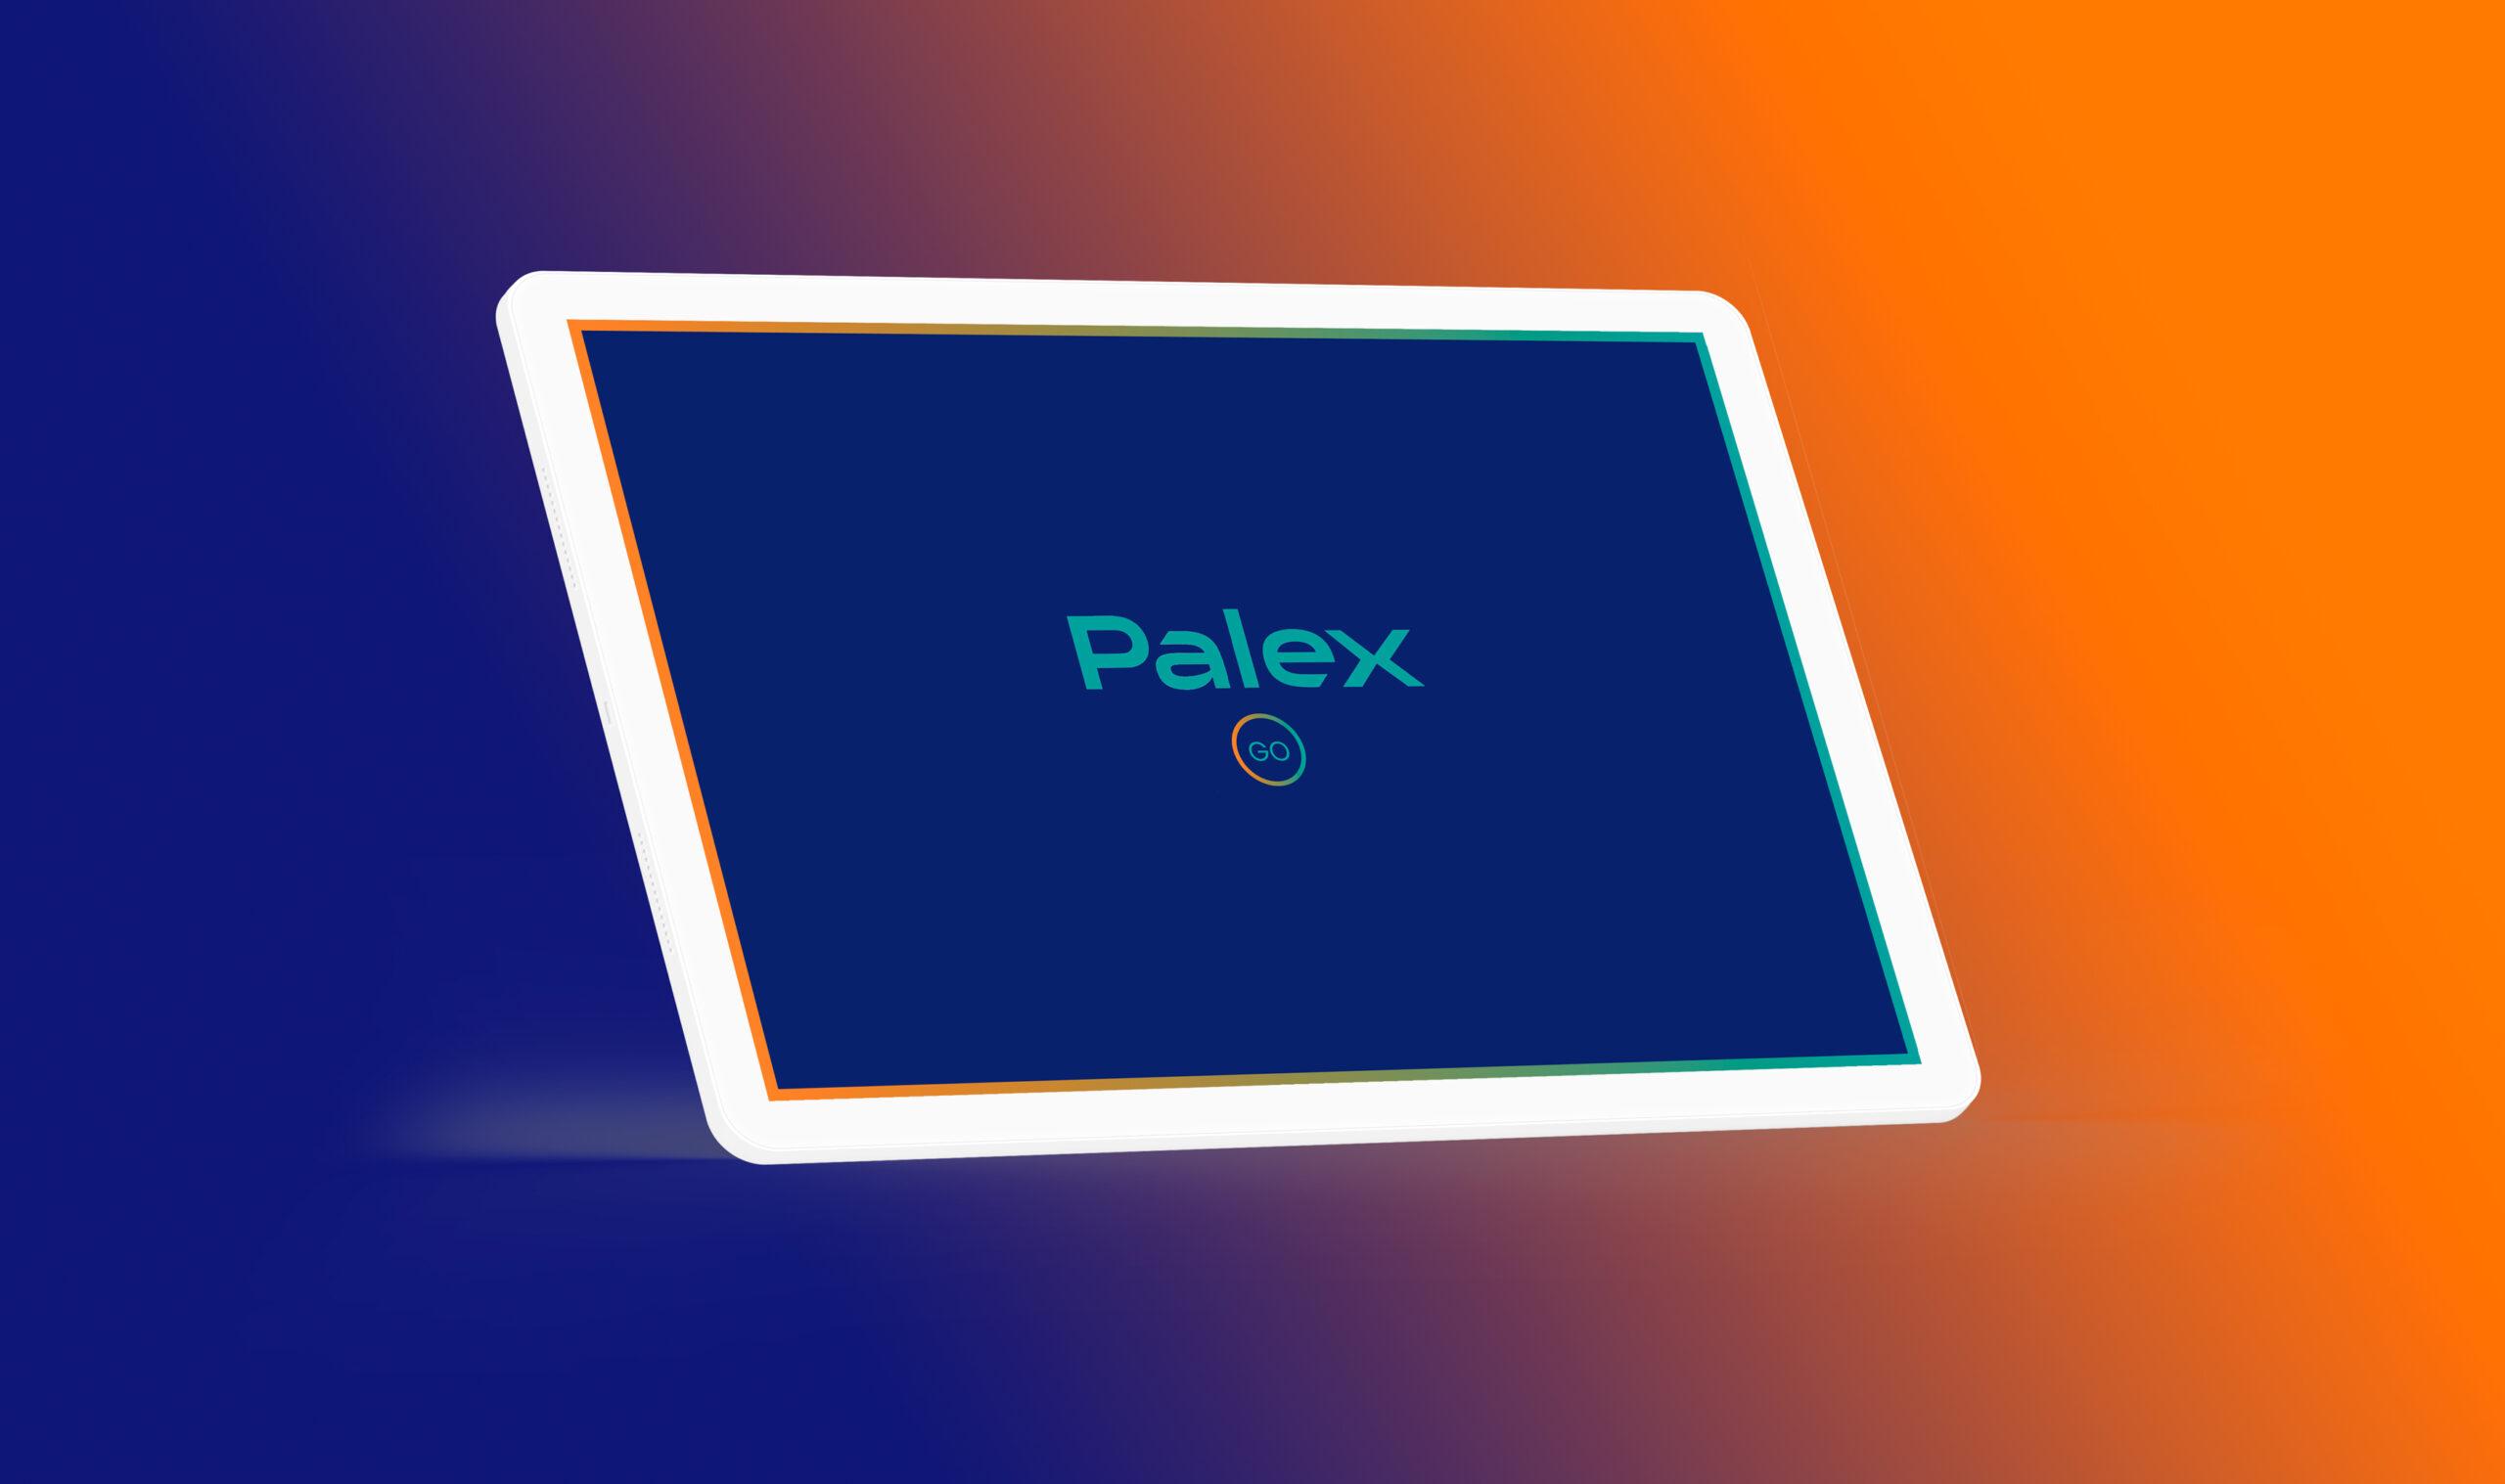 palex-1-einagrafic